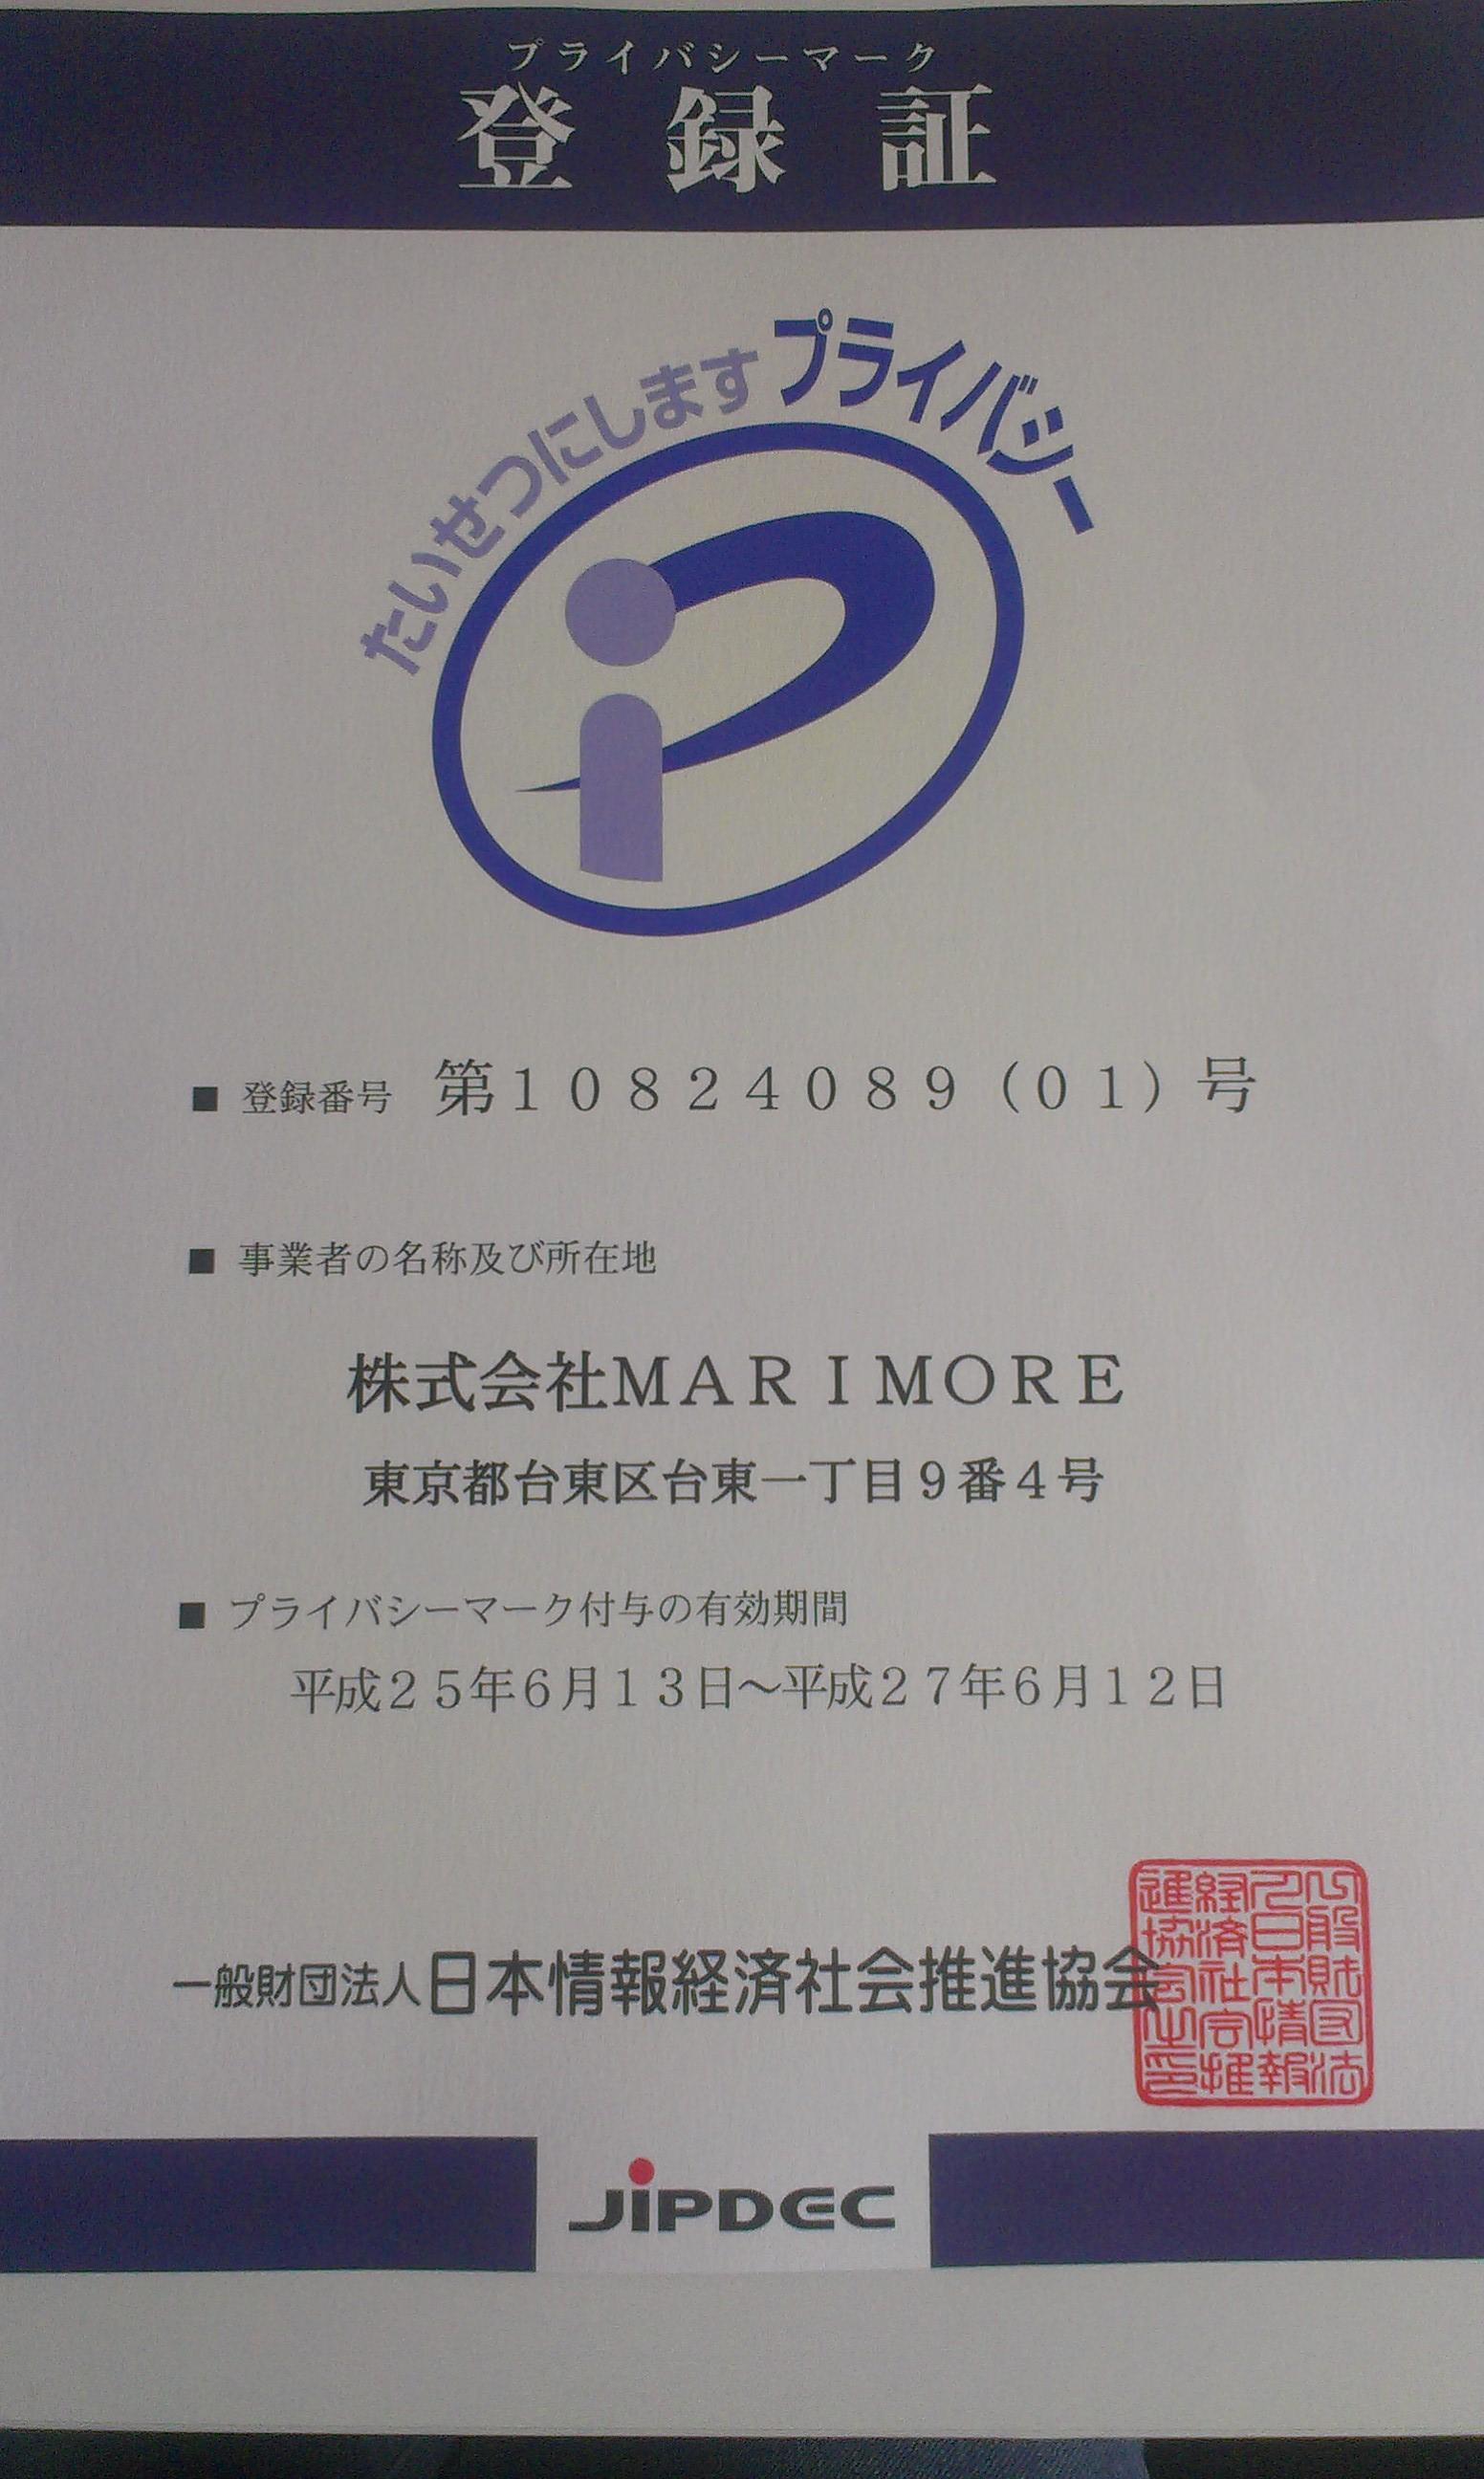 2013-06-12 12.33.52